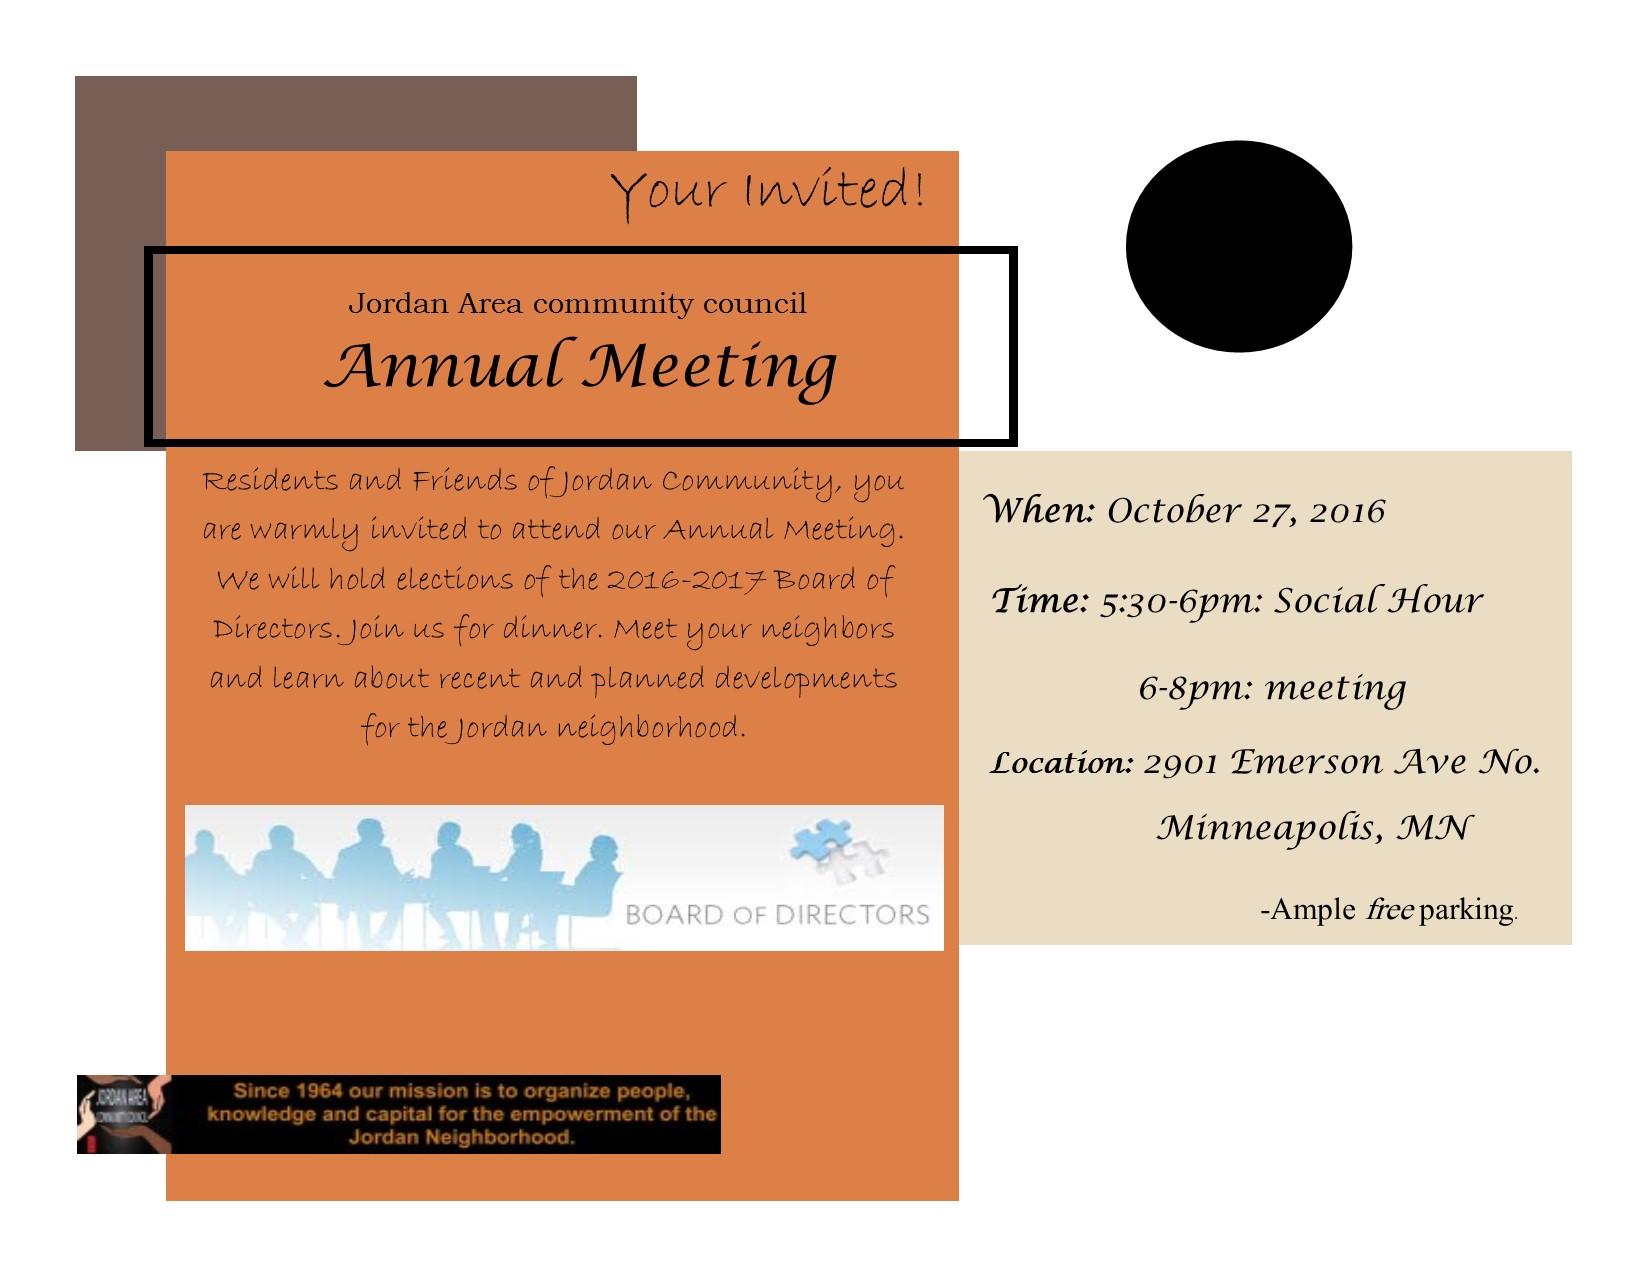 annual meeting flyer 16 jordan area community council